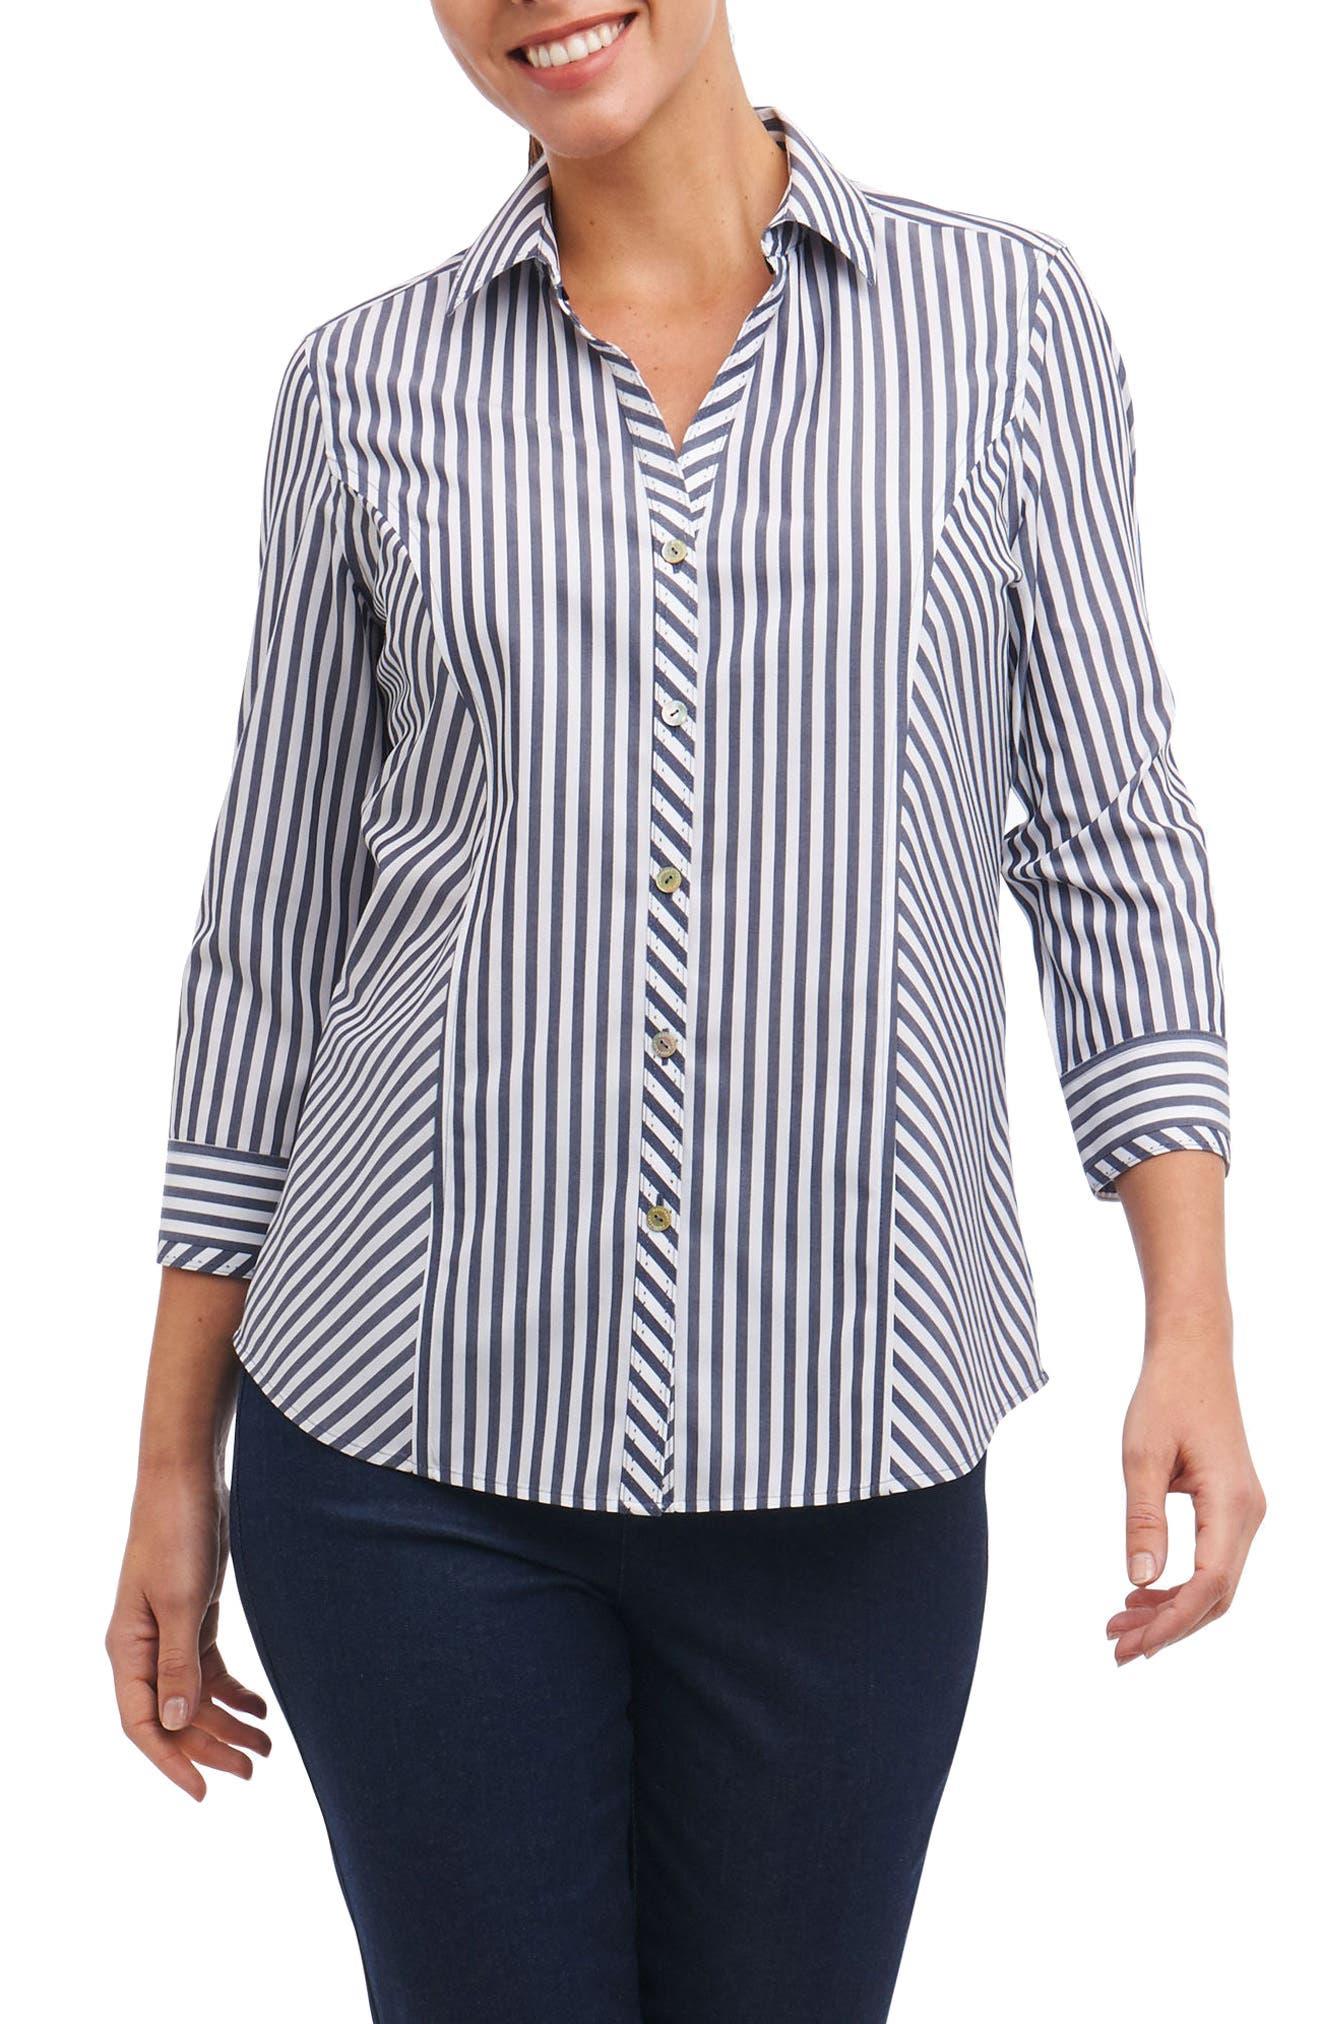 Hope Preppy Stripe Cotton Shirt,                         Main,                         color, Navy